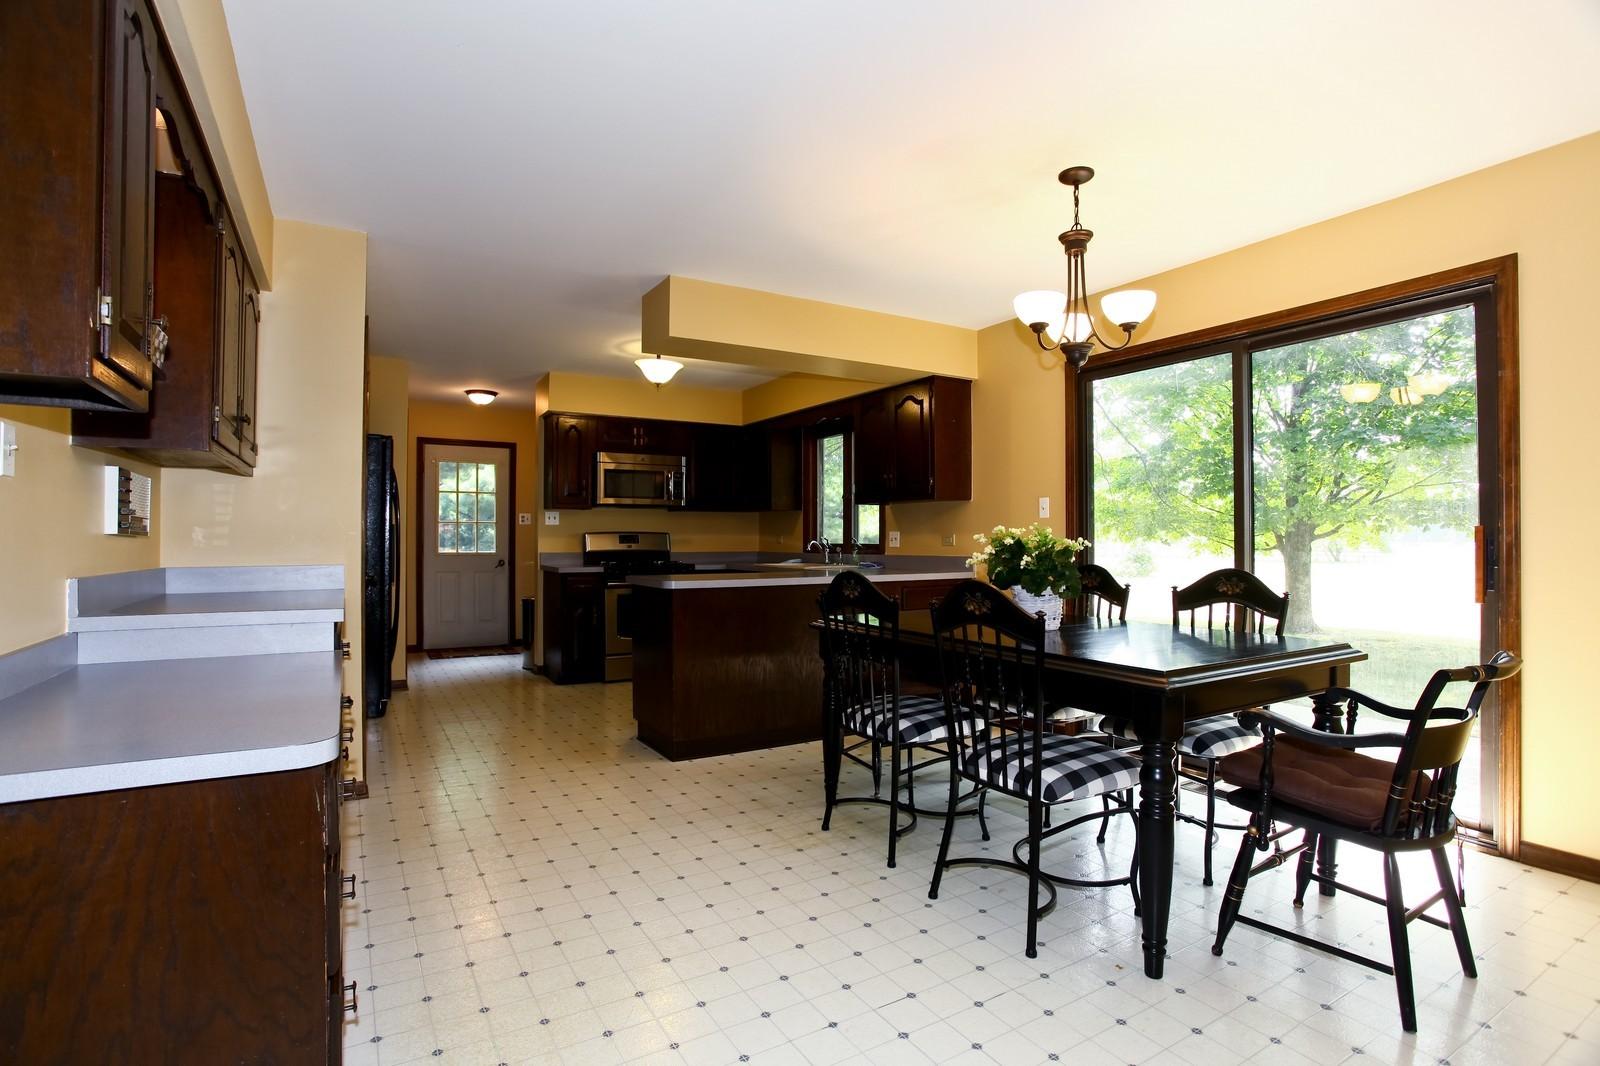 Real Estate Photography - 5N300 Sundance, Saint Charles, IL, 60175 - Kitchen / Breakfast Room